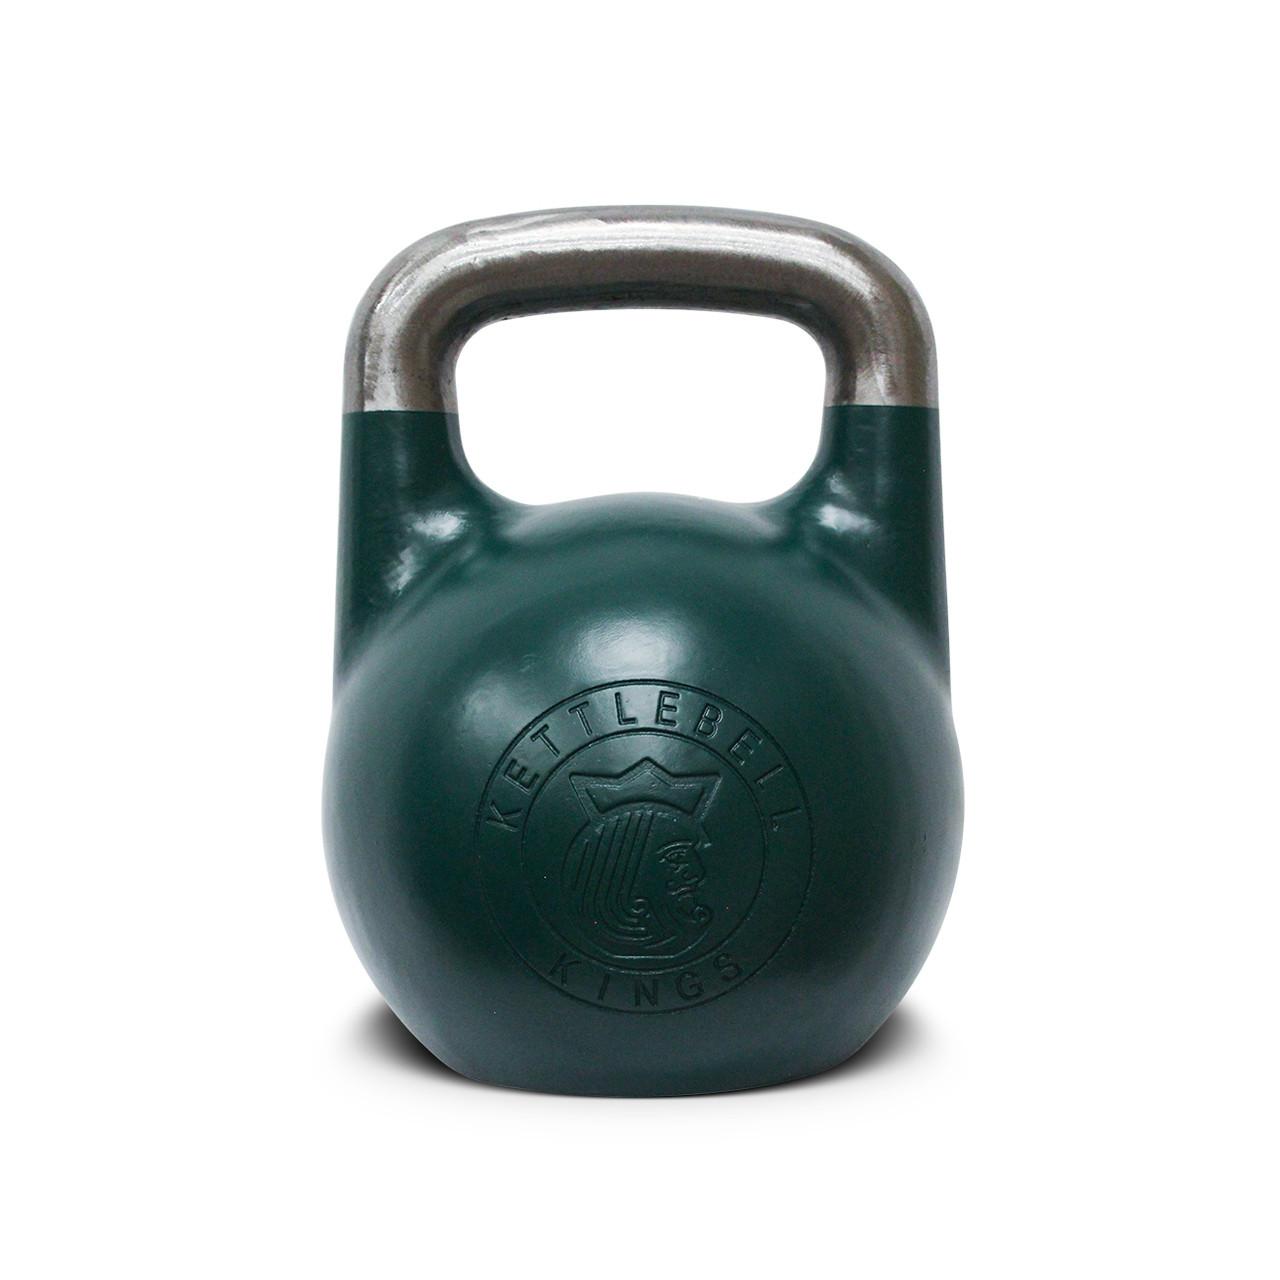 16 kg Adjustable to 32 kg Steel Competition Kettlebell Kettle bell